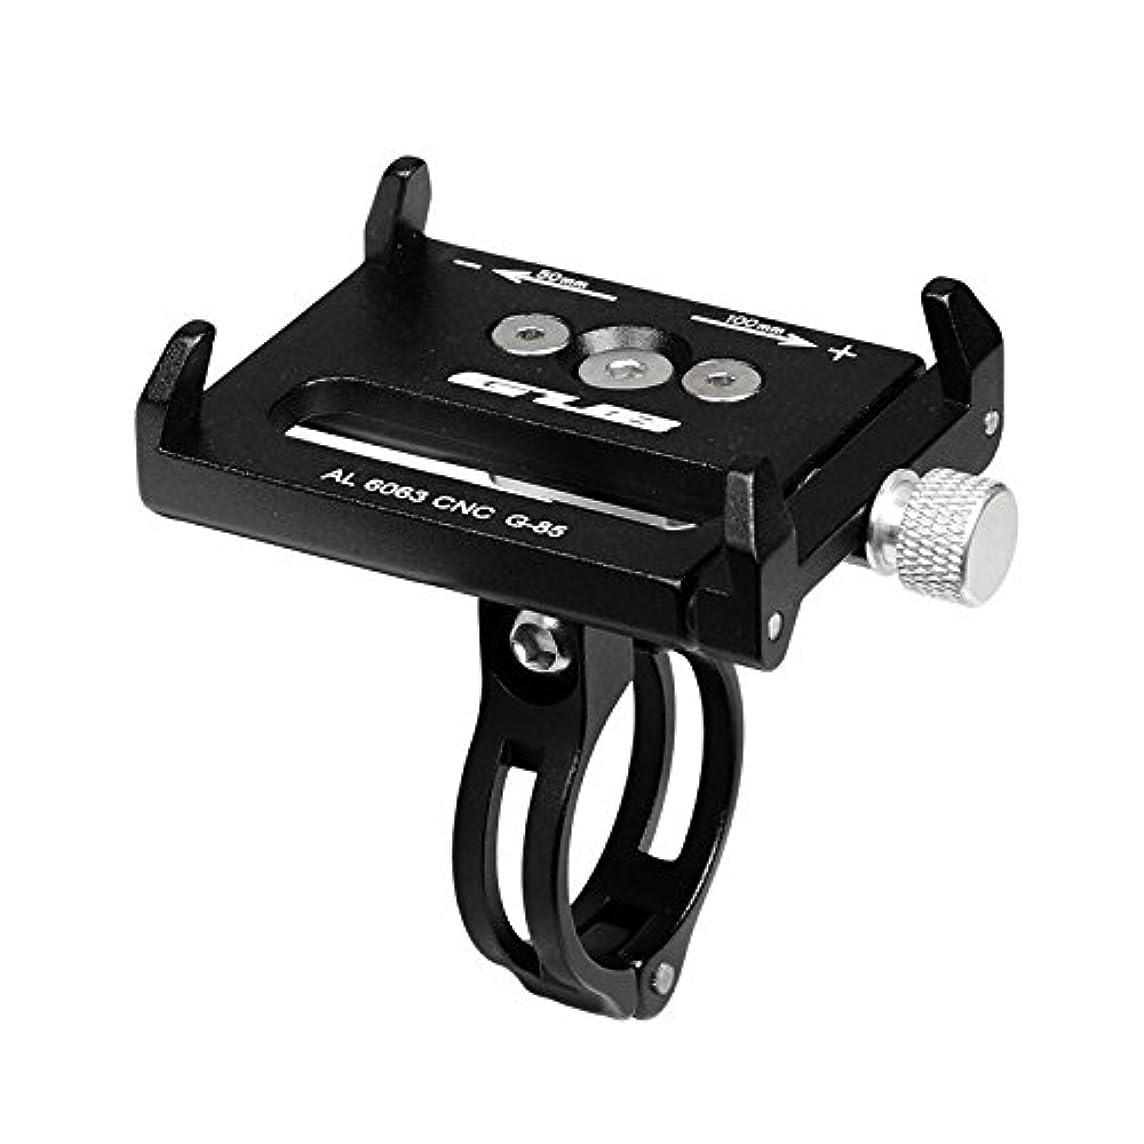 GUB G-85 Bike CNC Phone Holder 3.5-6.2 inch Phone Mount Support GPS Case Bicycle Motorcycle Handlebar Extender